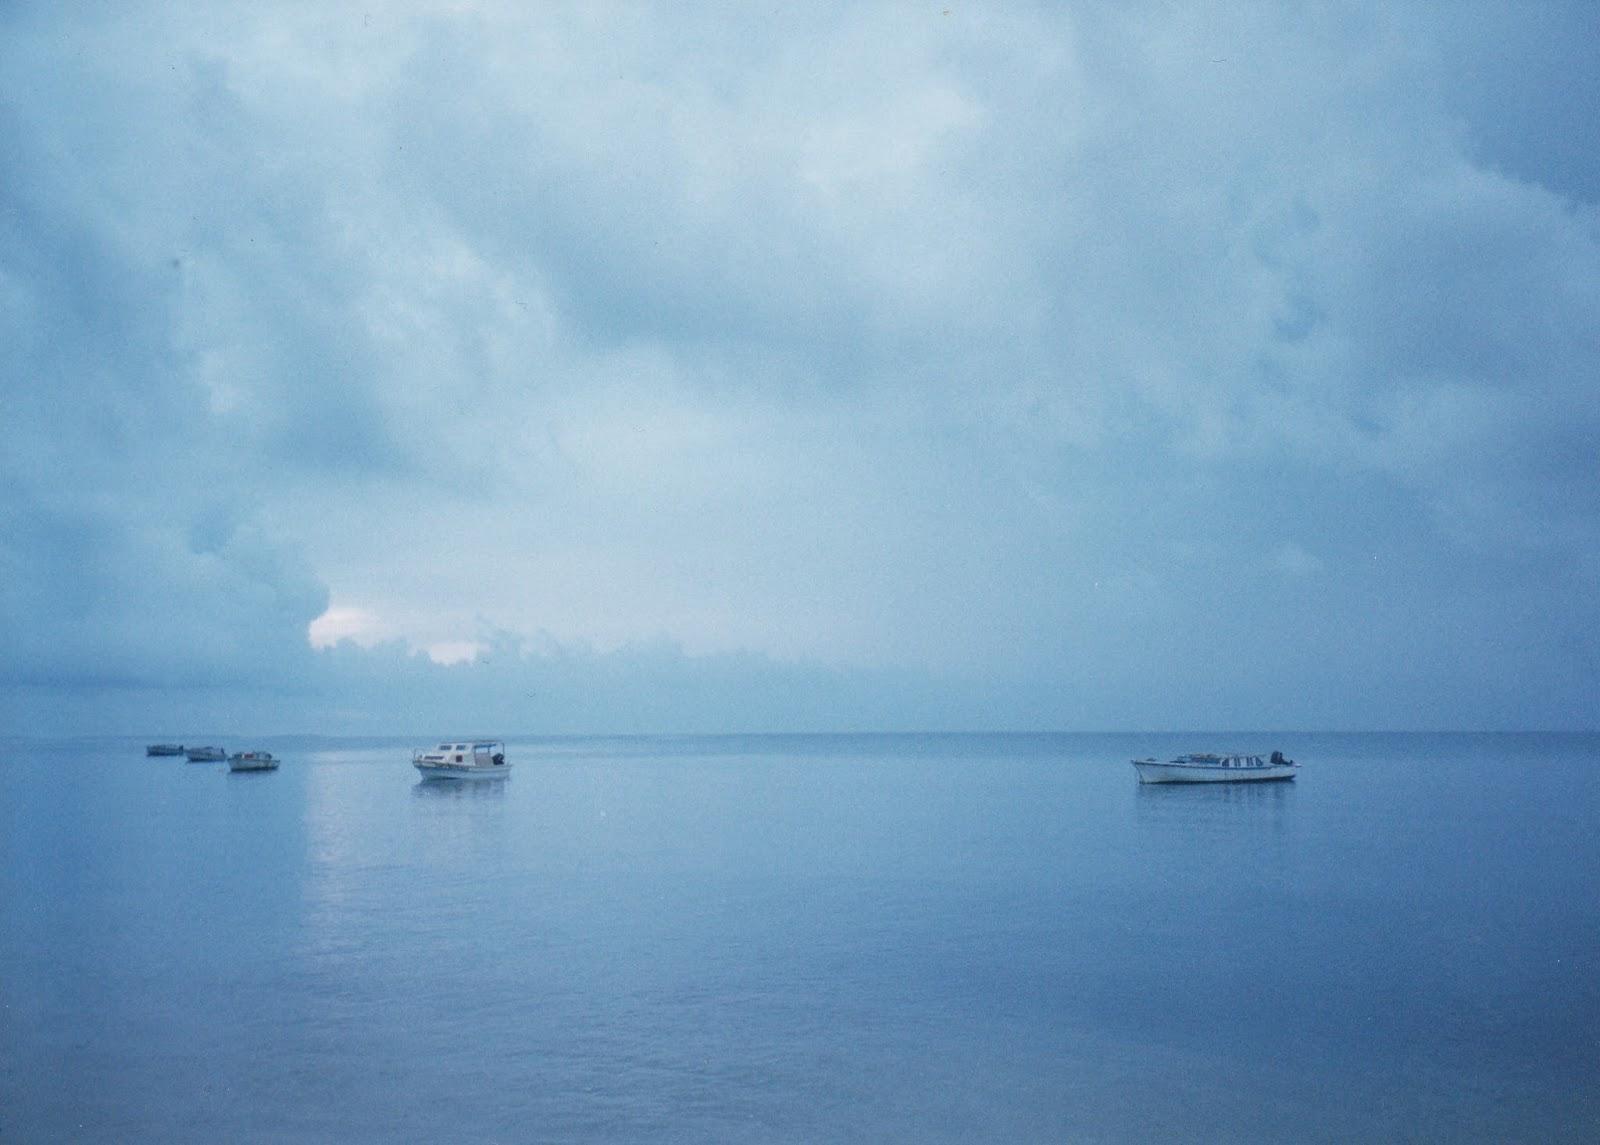 Tonga travels brings a beautiful twilight scene